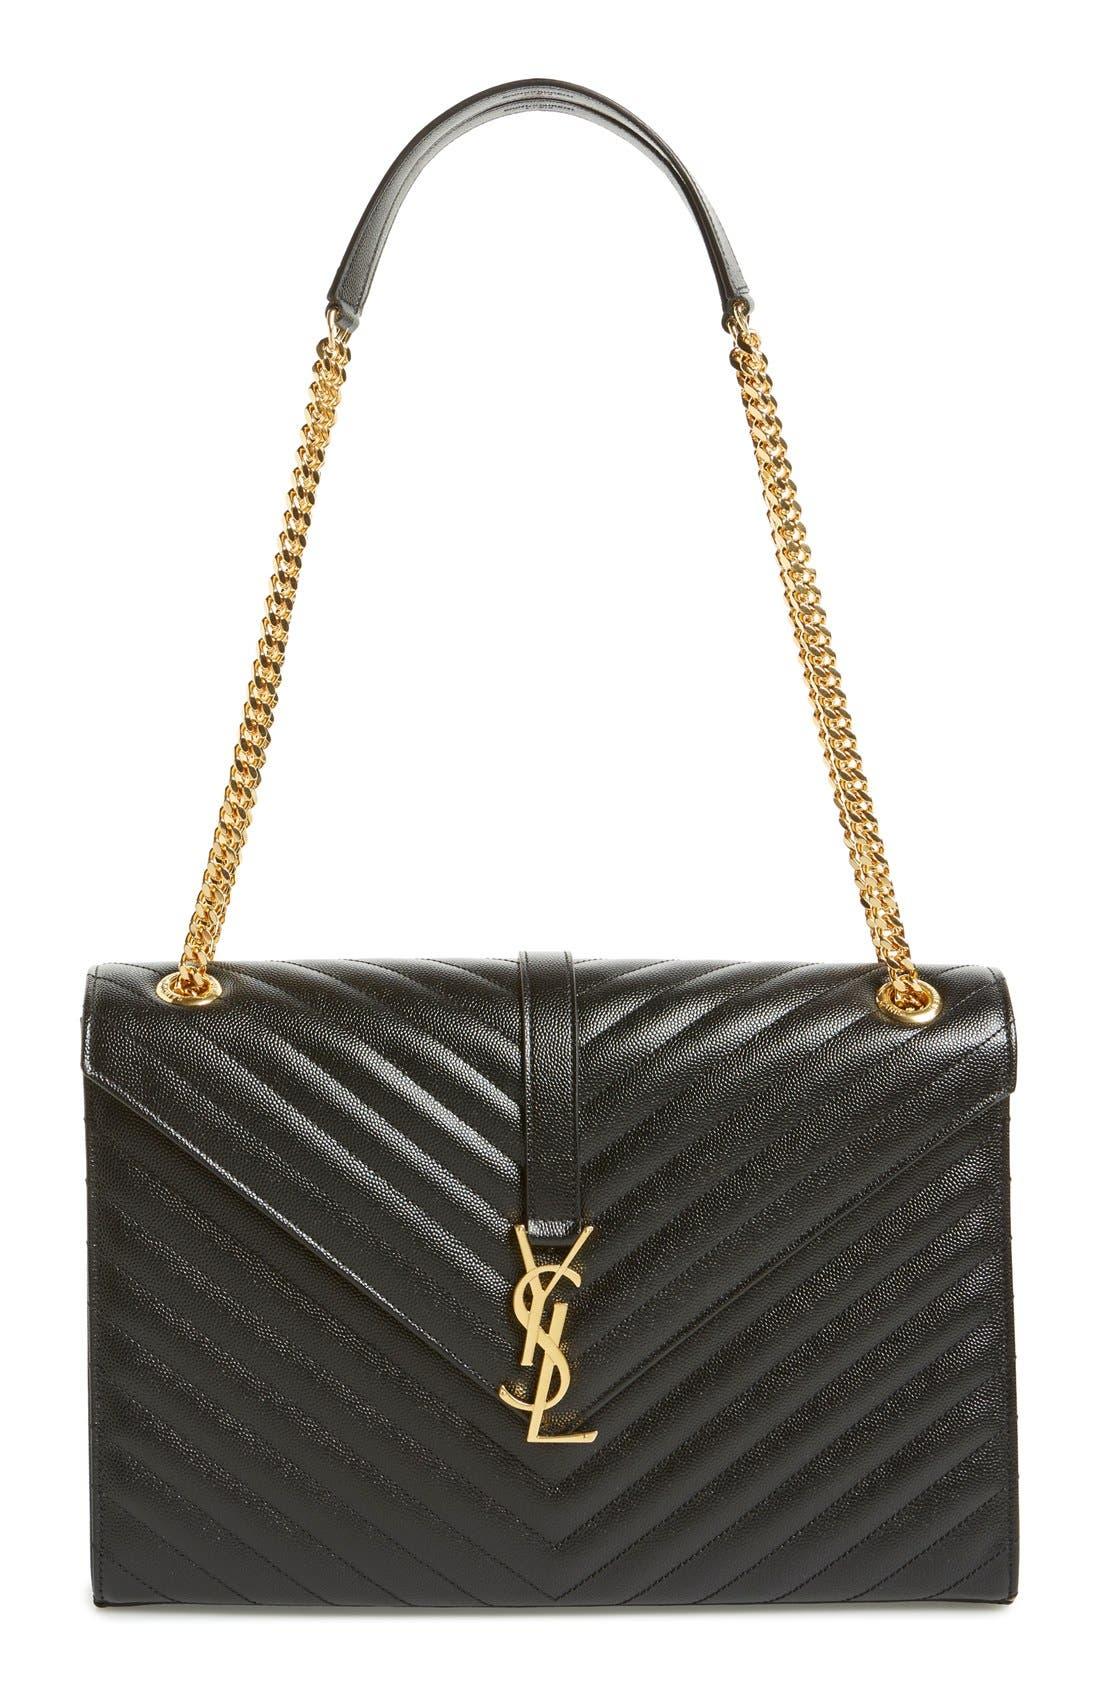 Main Image - Saint Laurent 'Large Monogram' Grained Leather Shoulder Bag